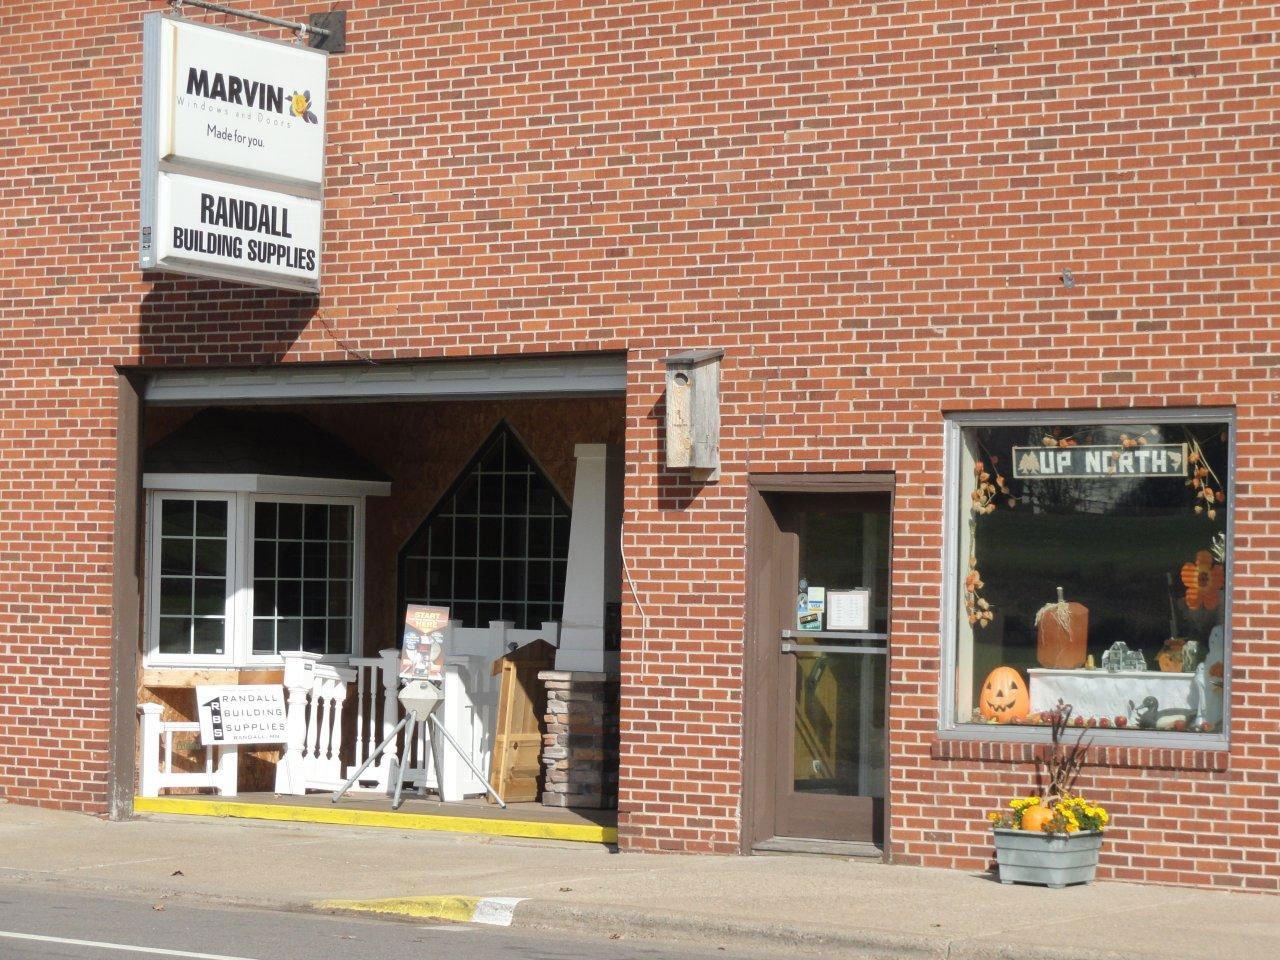 Randall Building Supplies